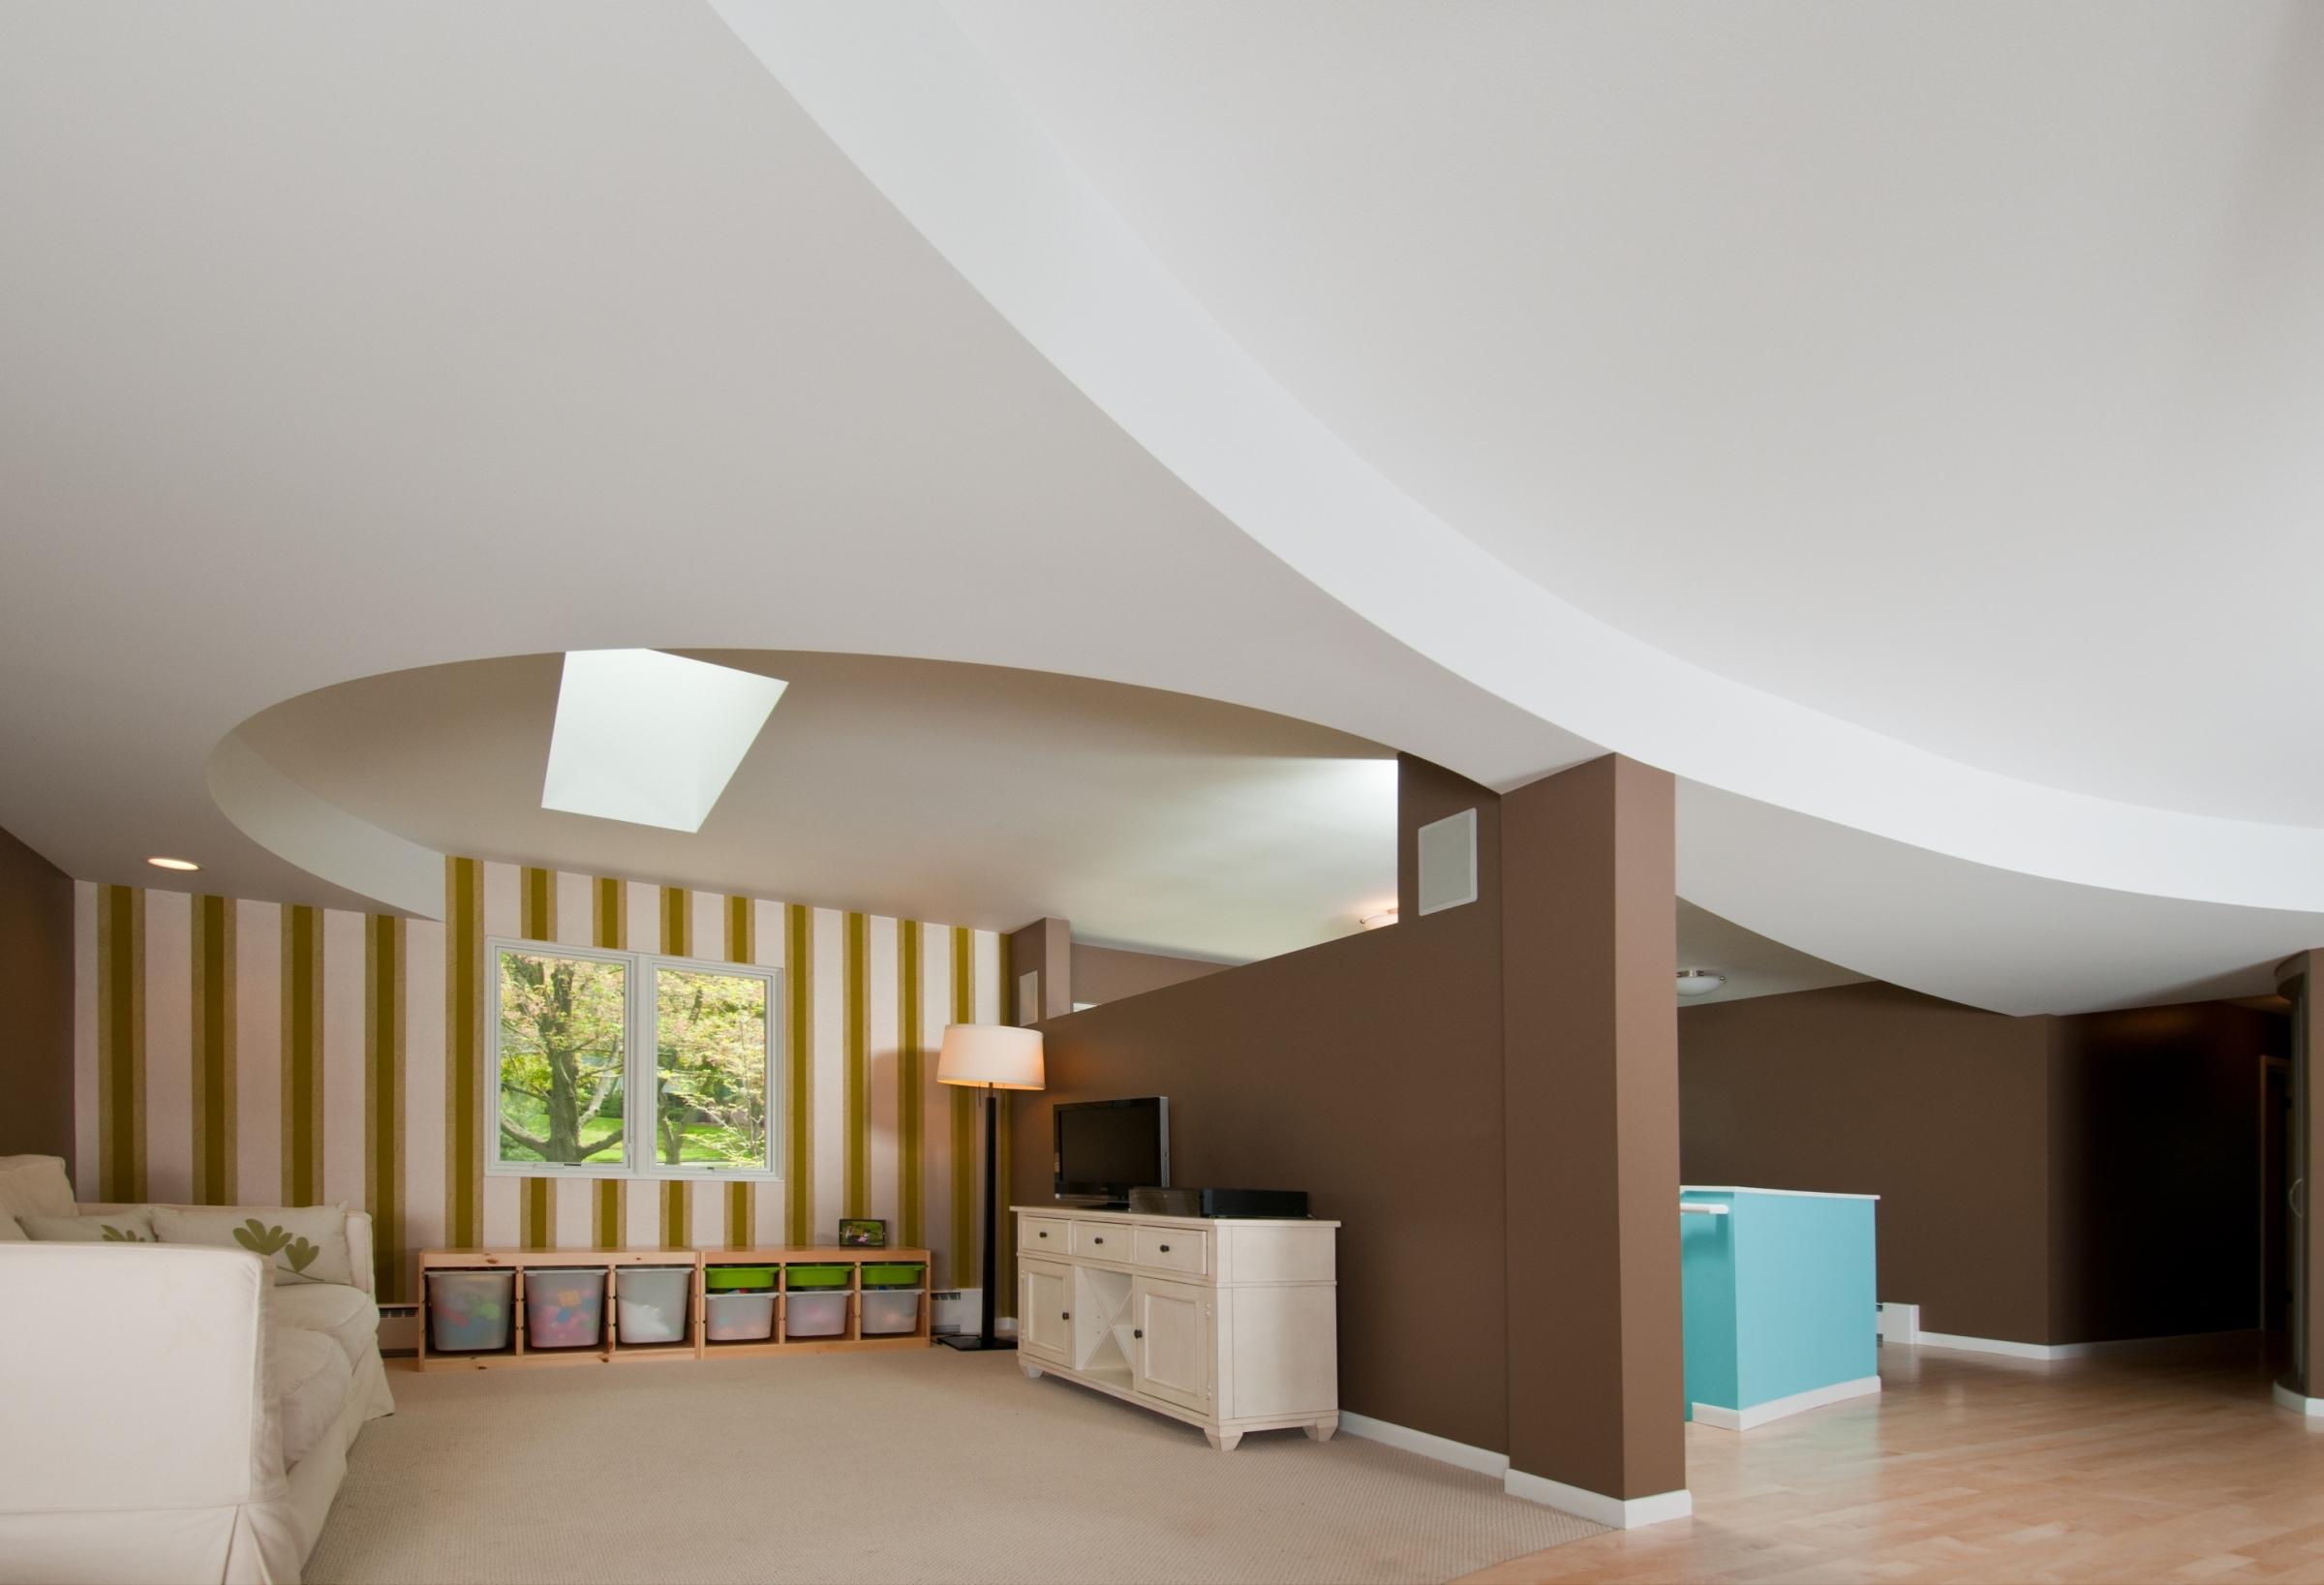 Interiors_09.jpg